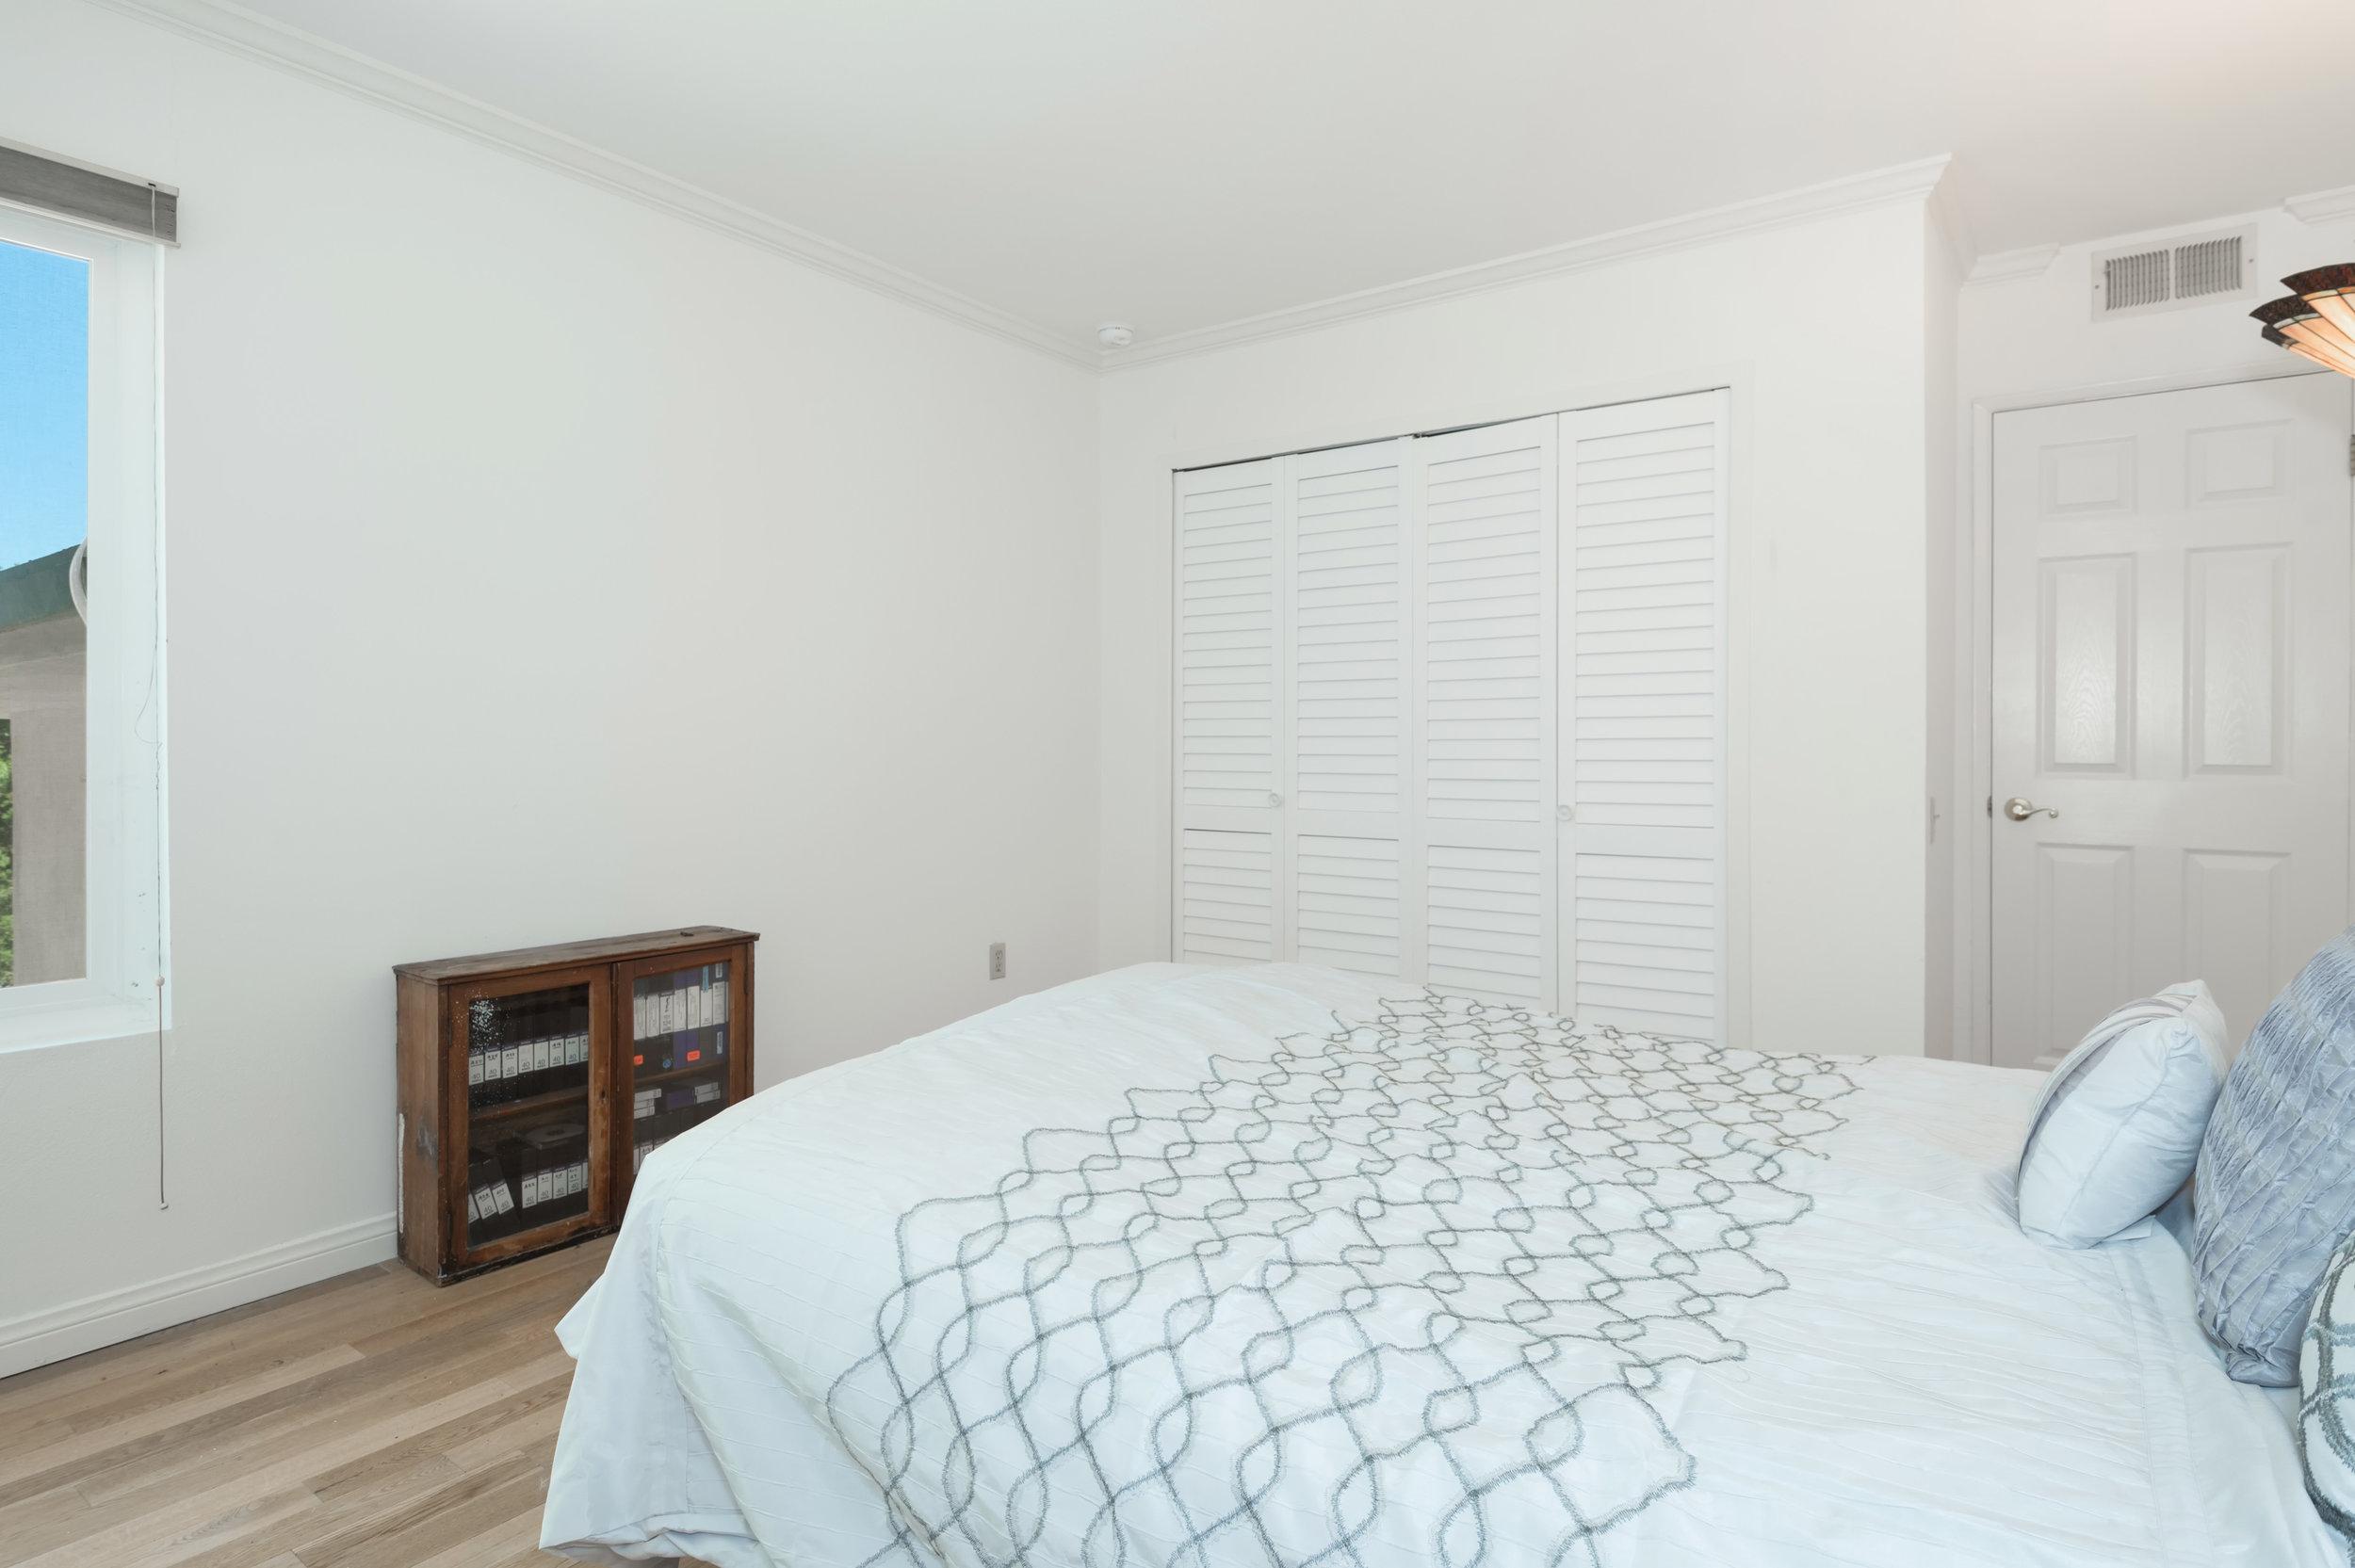 013 Bedroom 15072 Rayneta Sherman Oaks For Sale The Malibu Life Team Luxury Real Estate.jpg